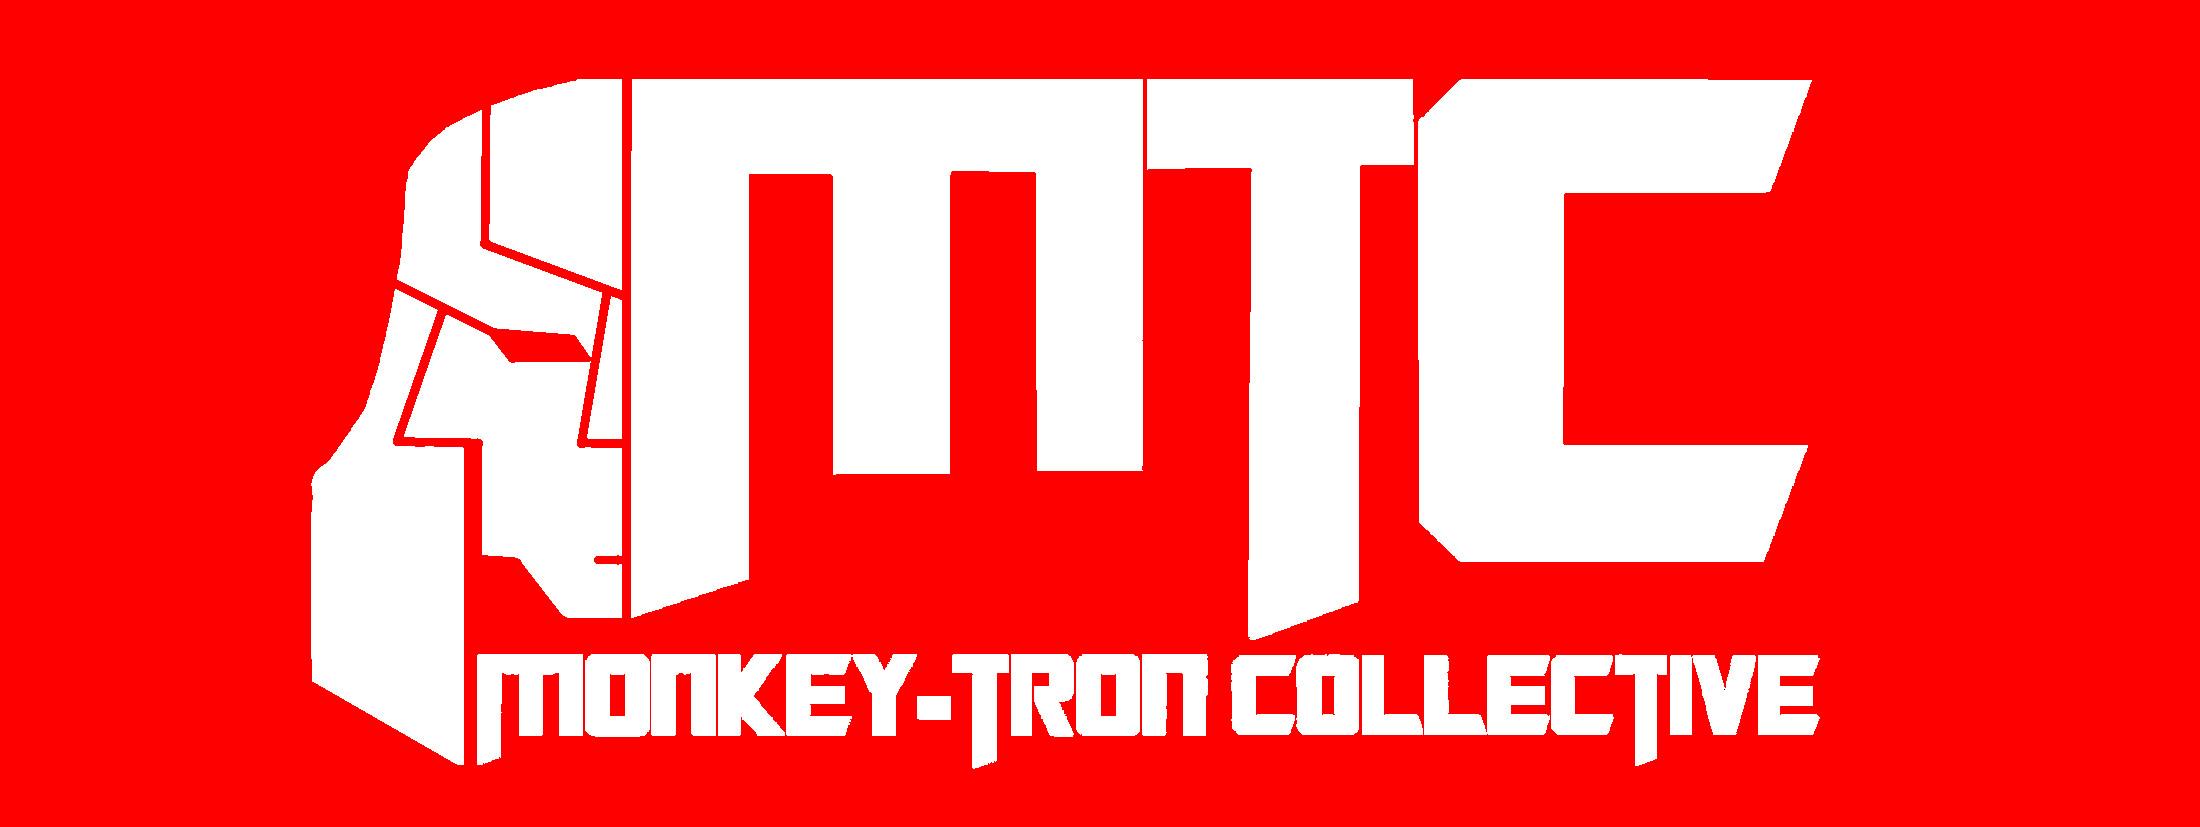 MTC Badge 05 jpg.jpg